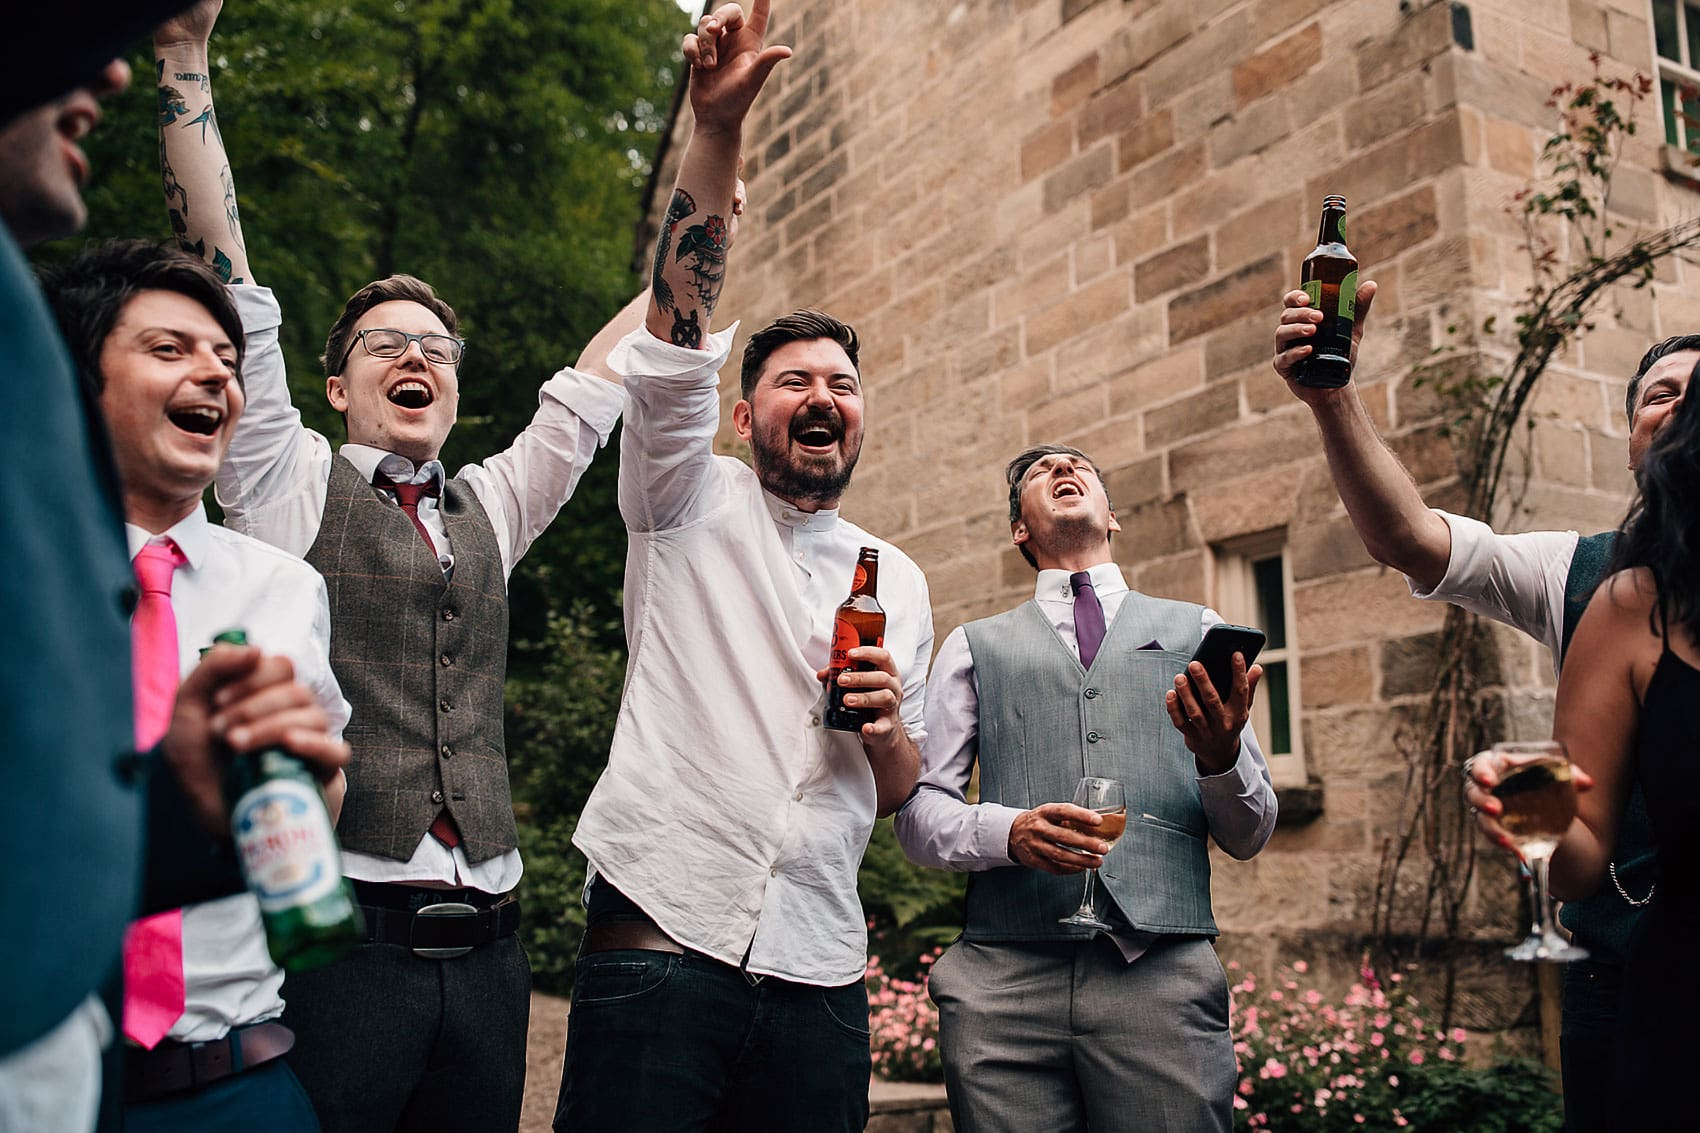 rustic outdoor wedding party Yorkshire